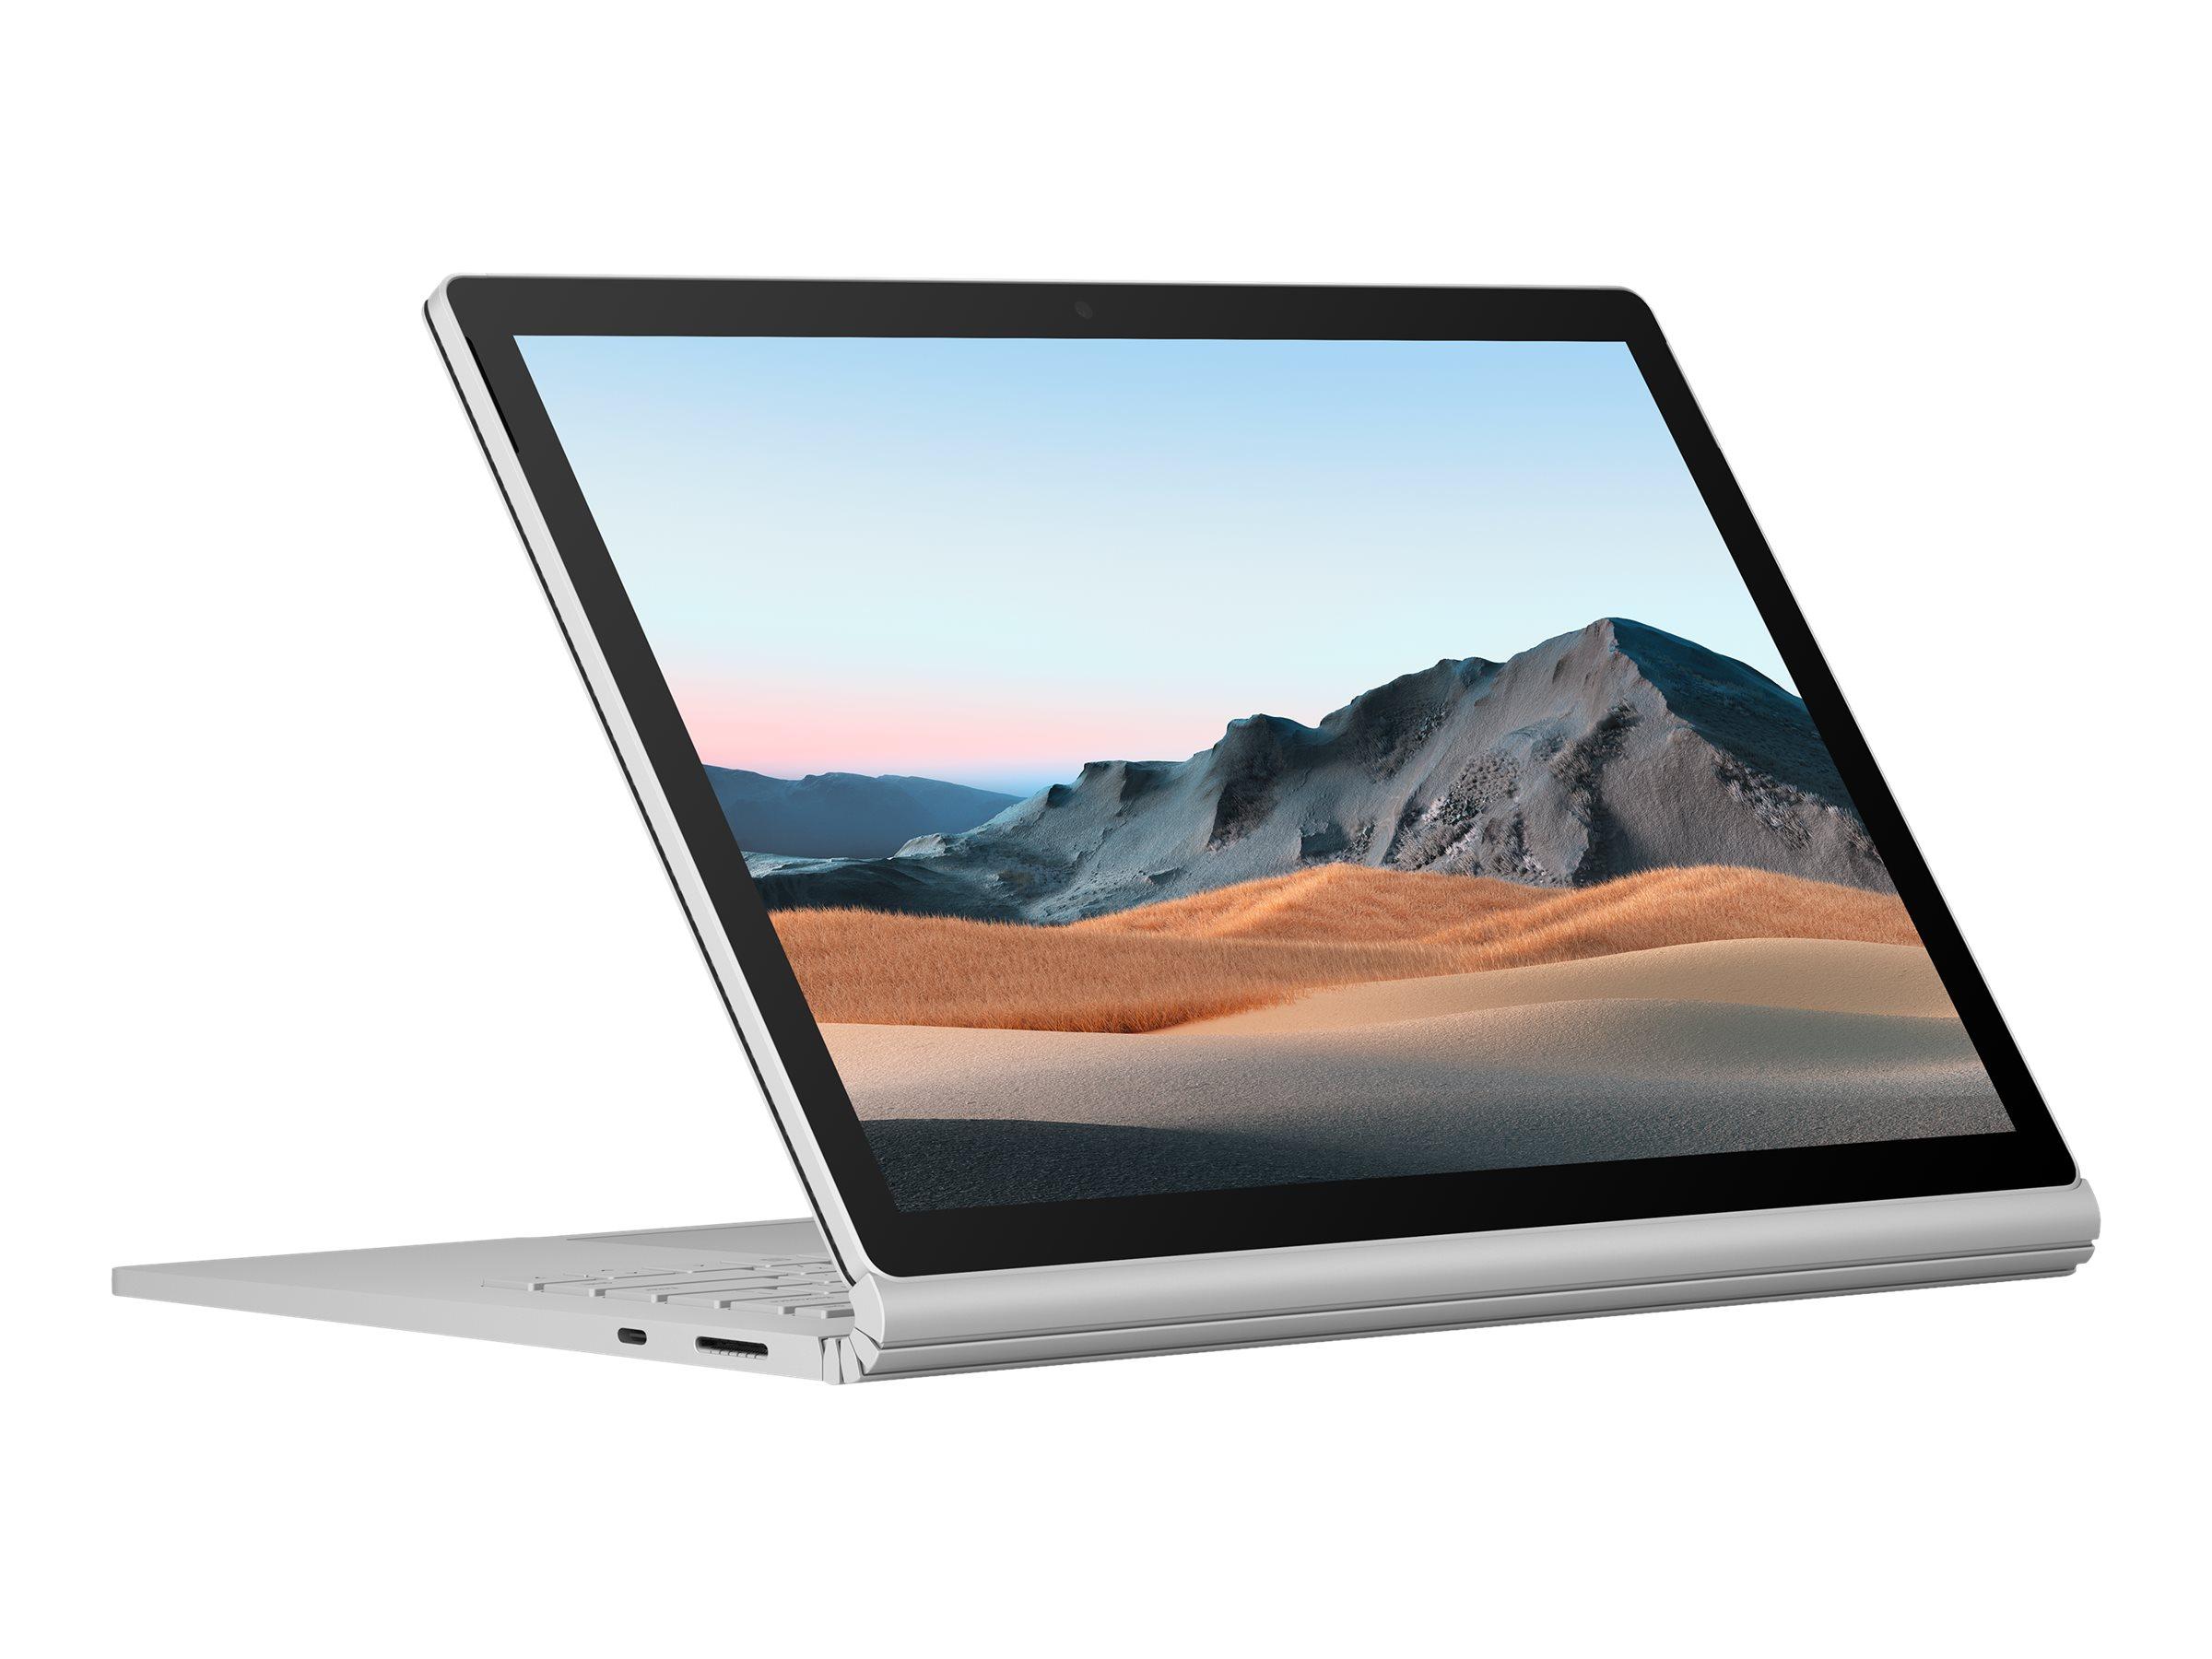 Microsoft Surface Book 3 - 13.5